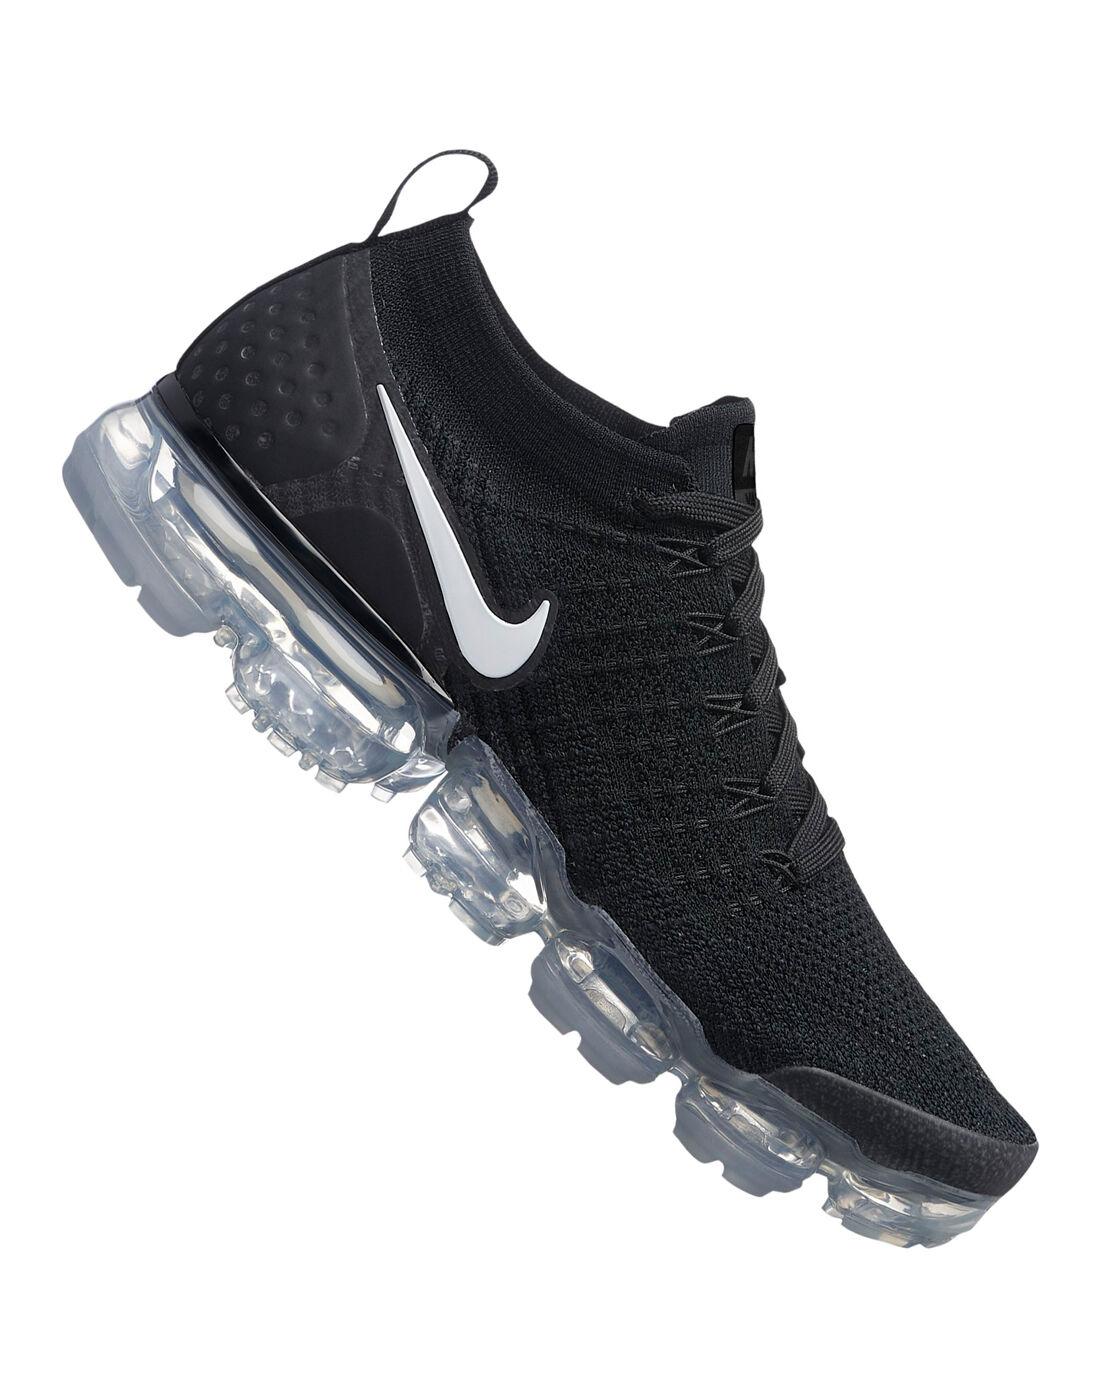 Nike Air VaporMax Flyknit 2 | Black